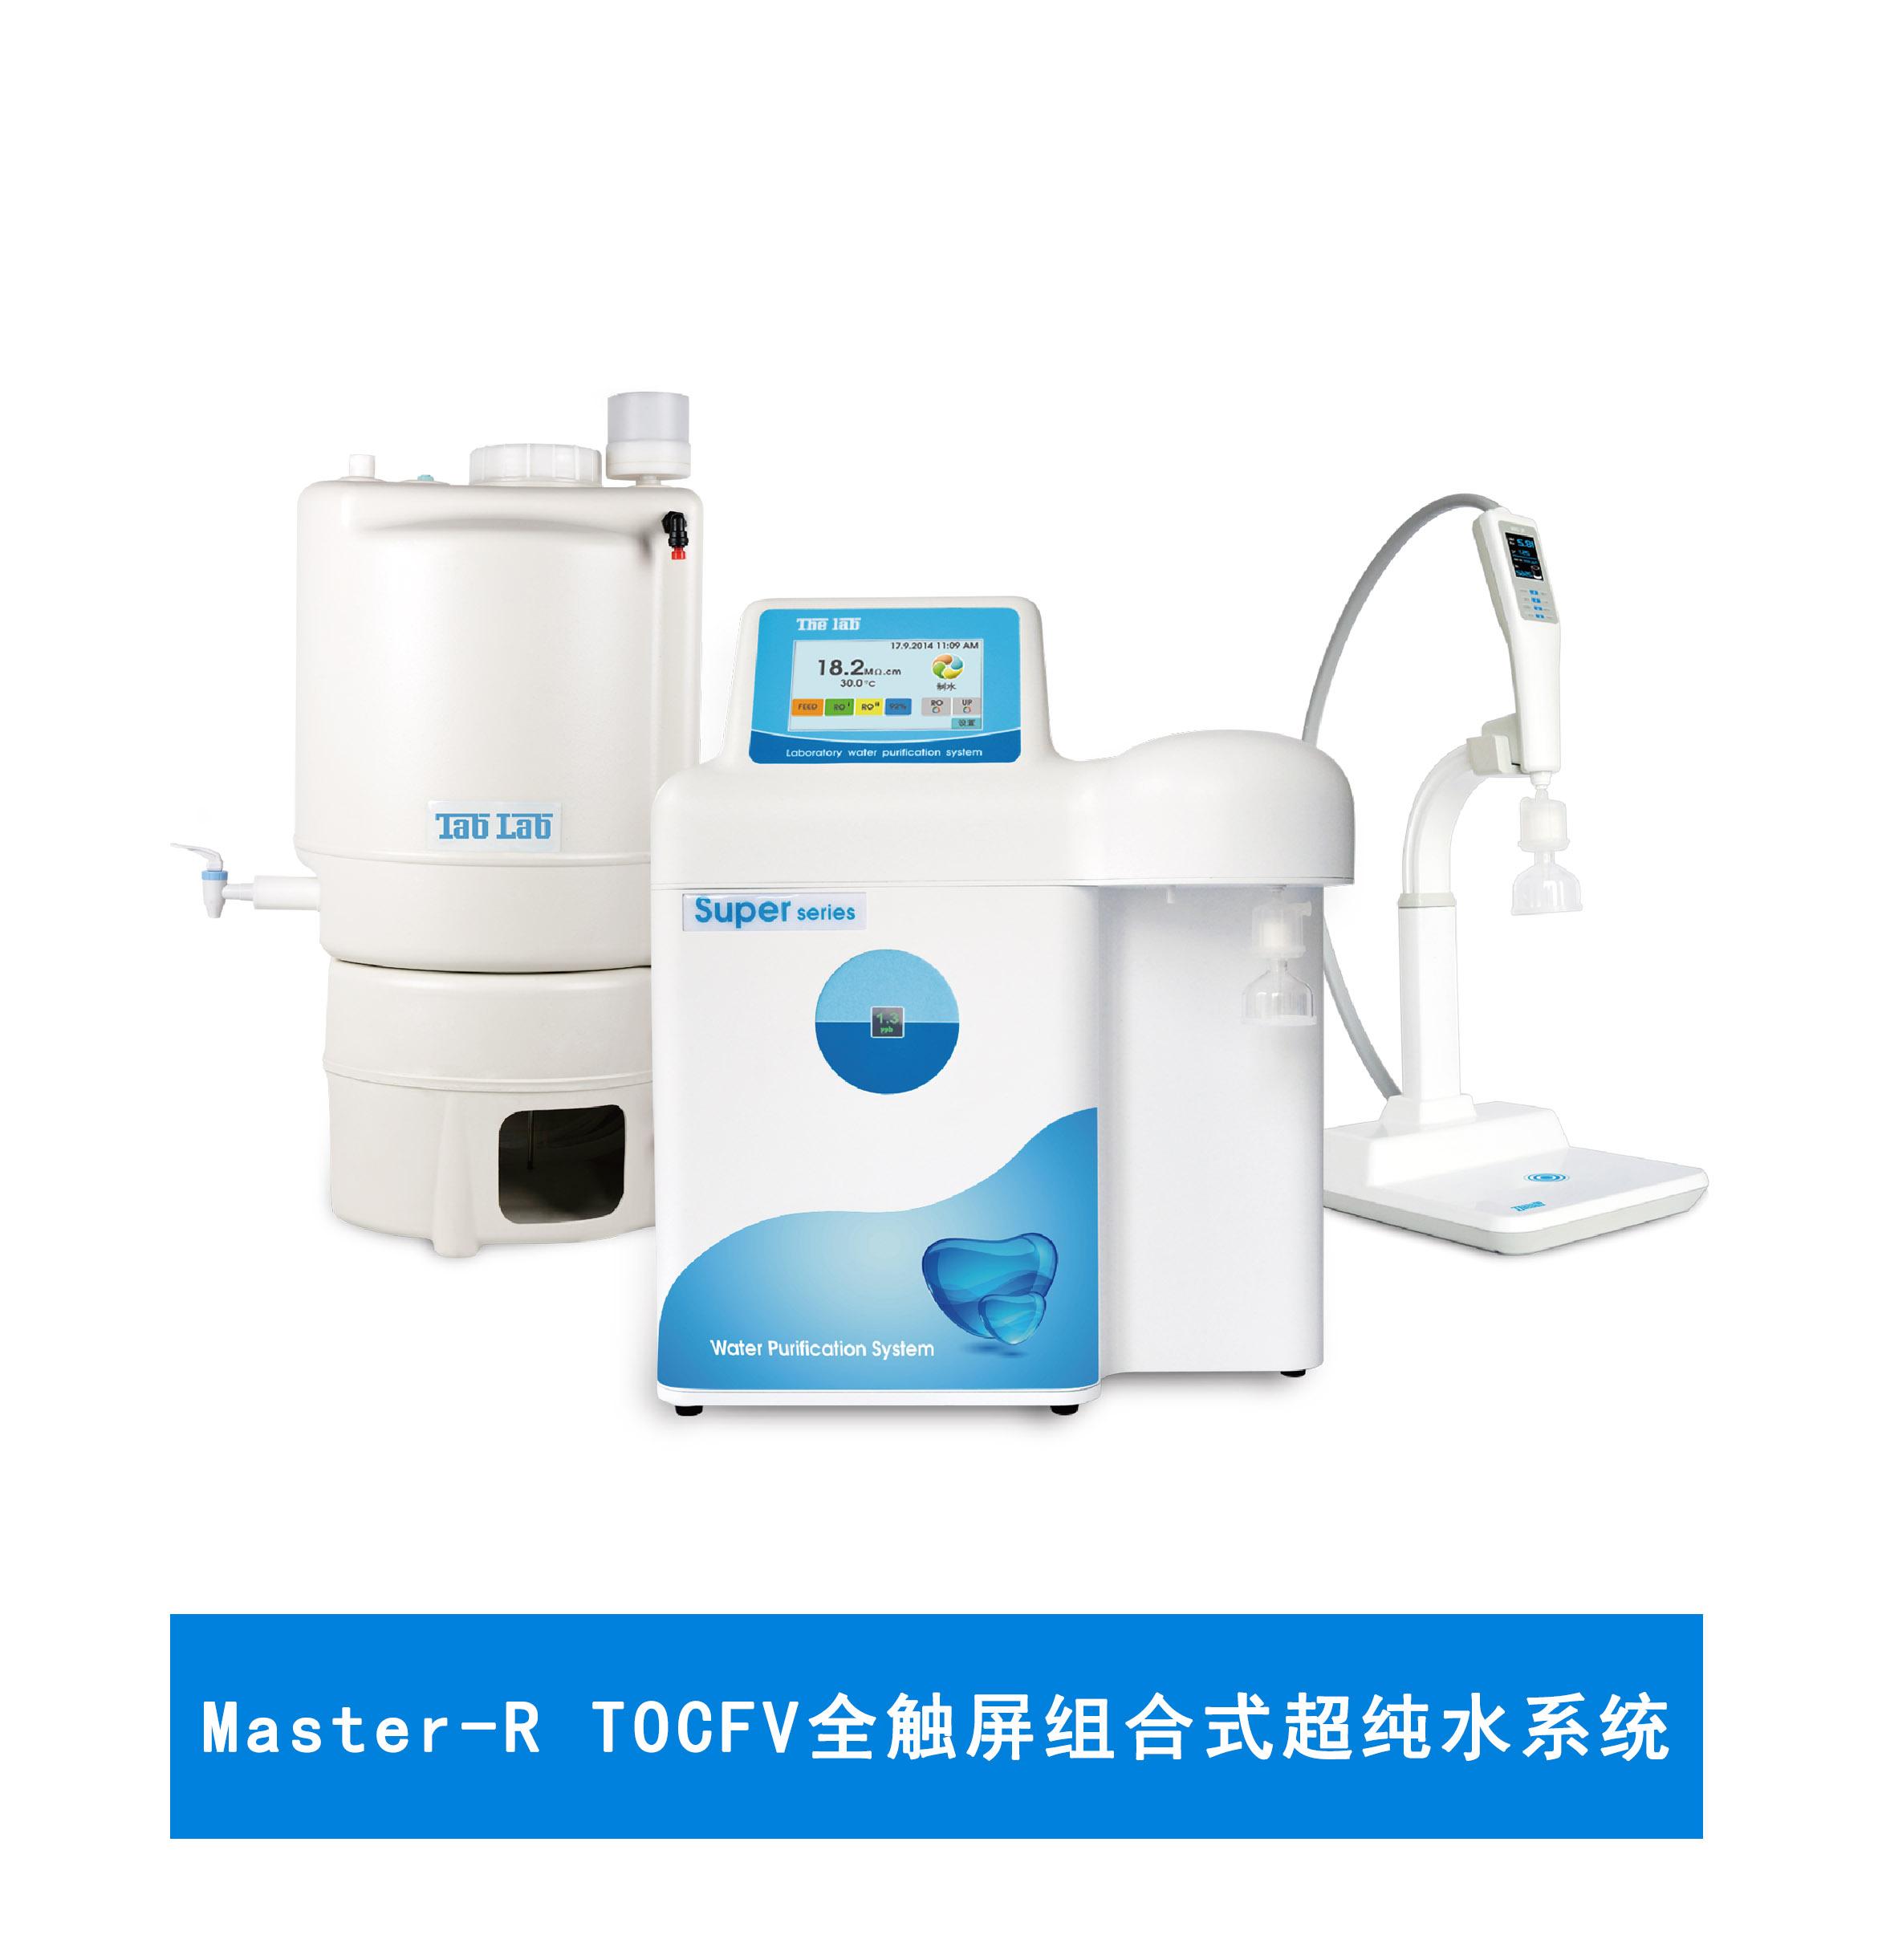 Master-R TOCFV全触屏组合式超纯水系统